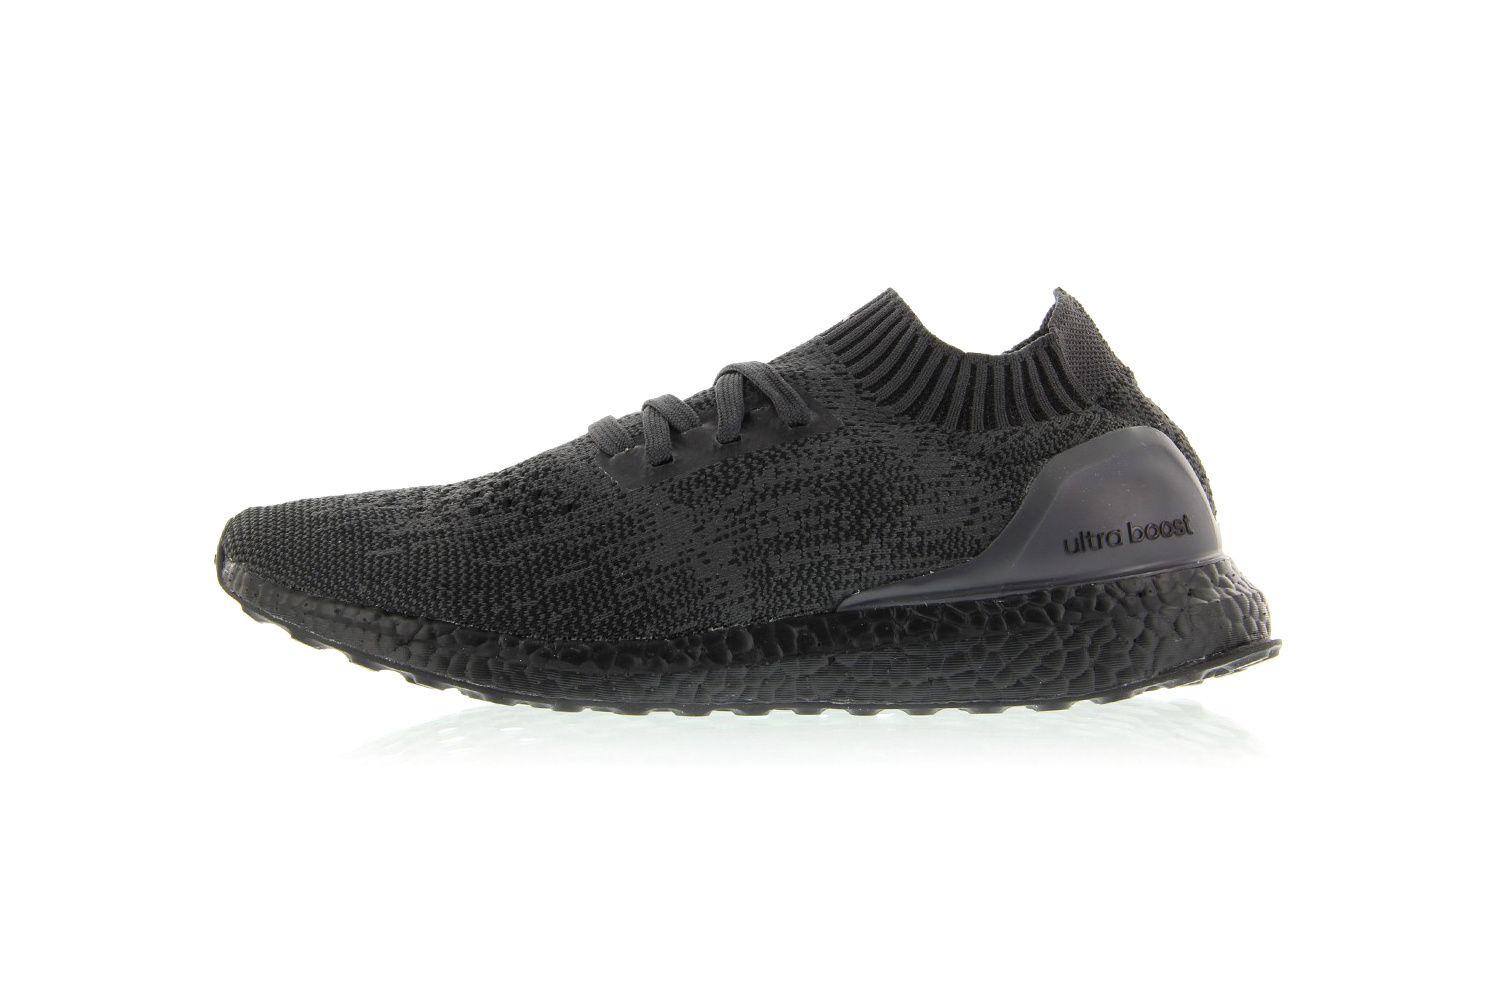 adidas boost triple black release date